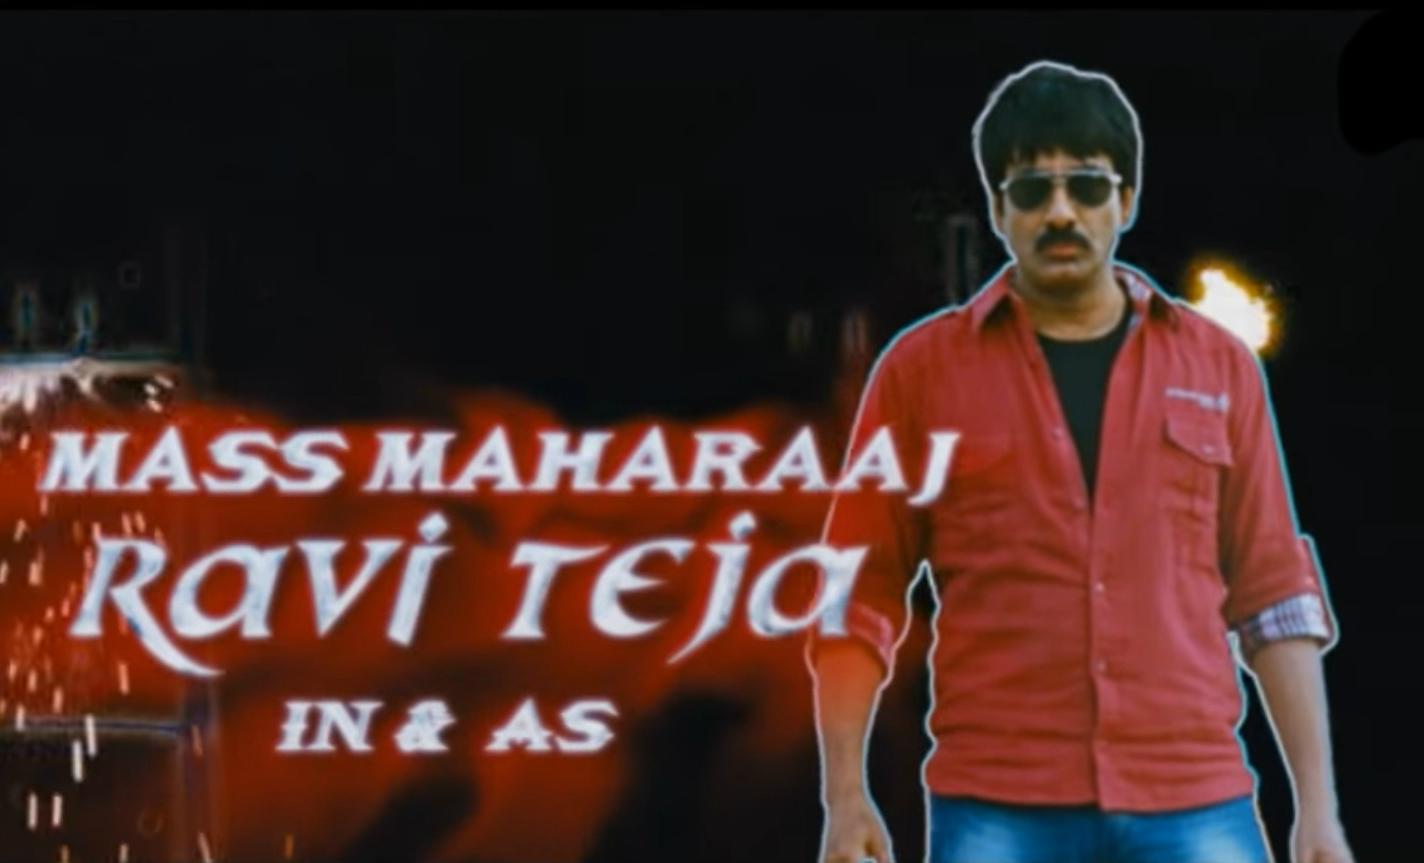 Ravi Theja